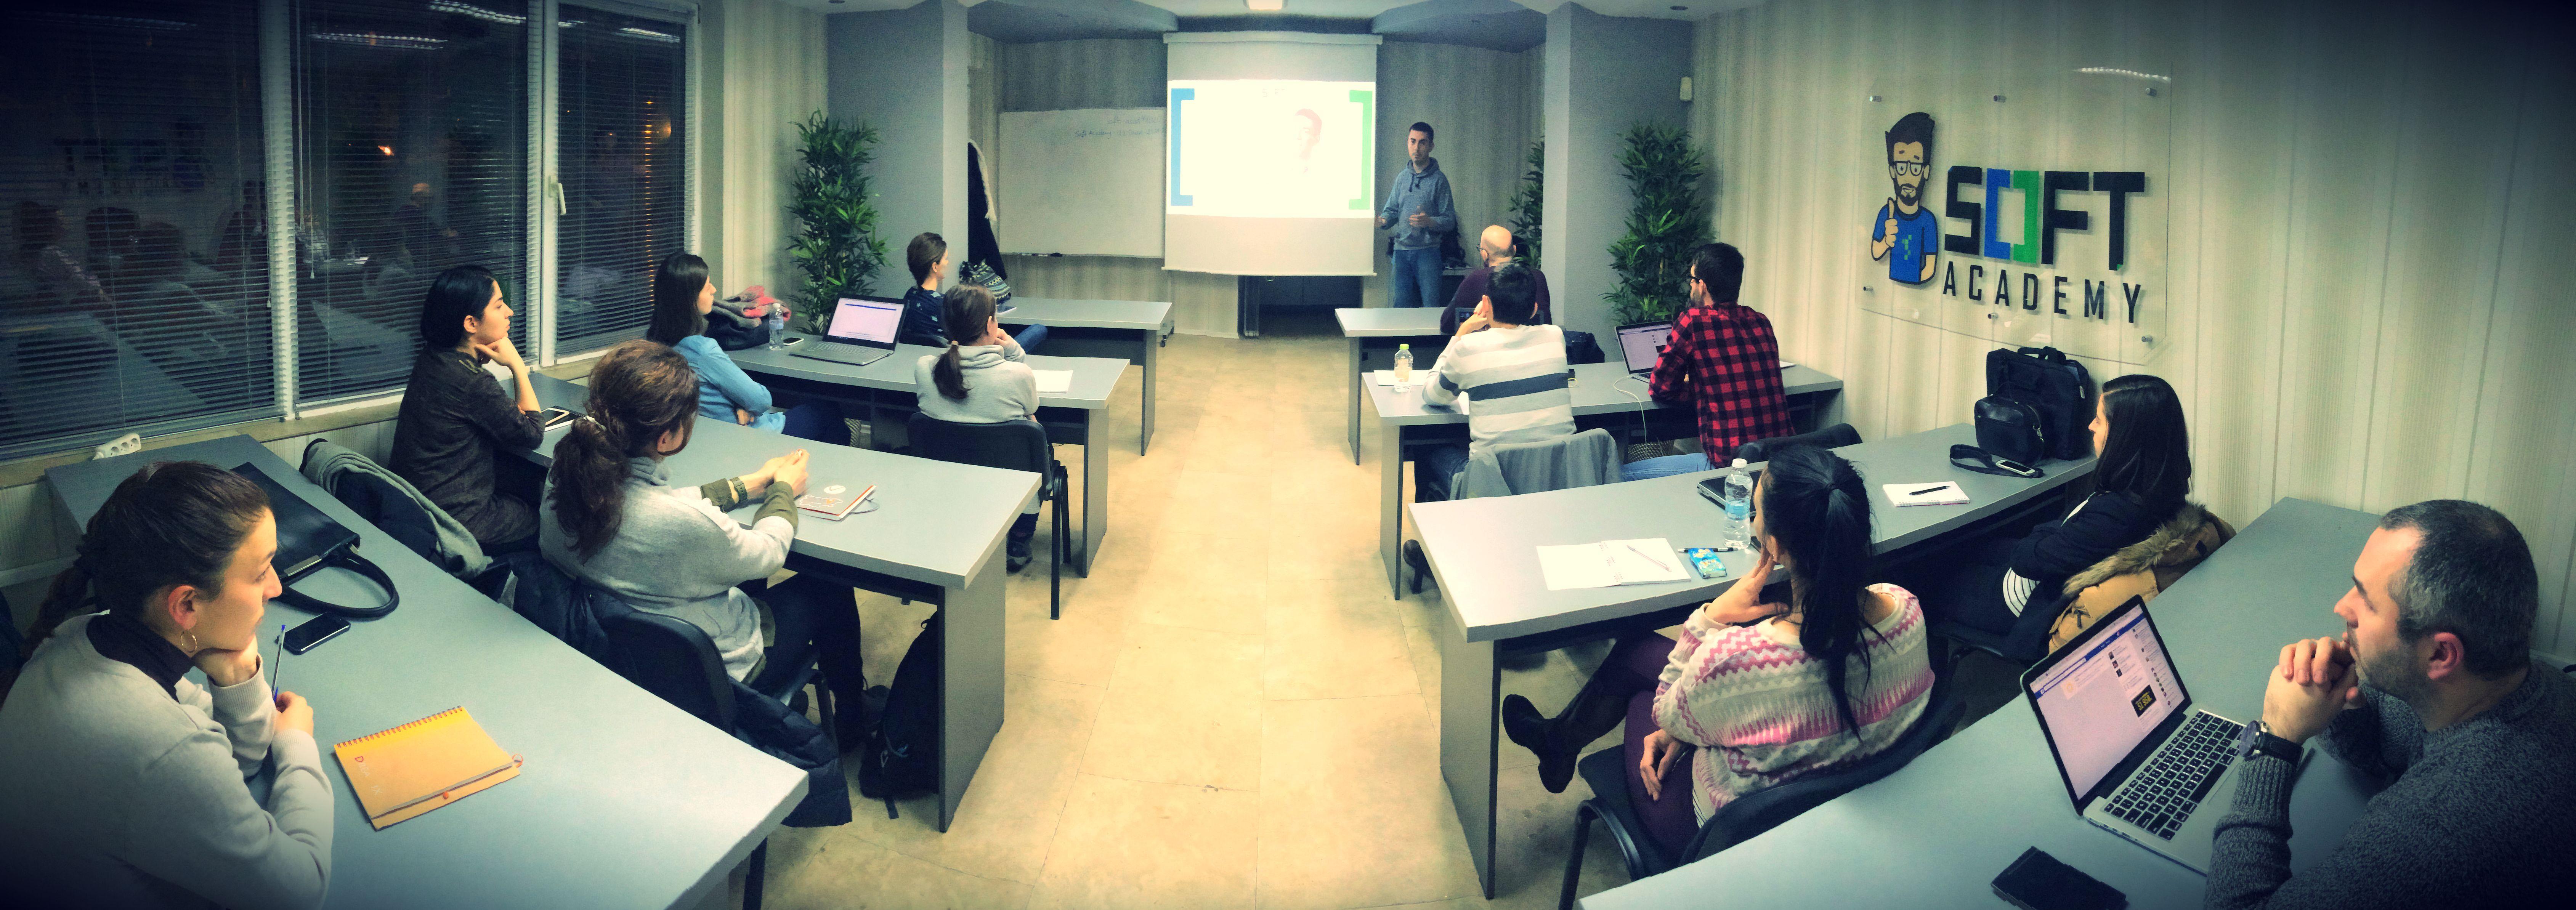 UX-course-softacademy